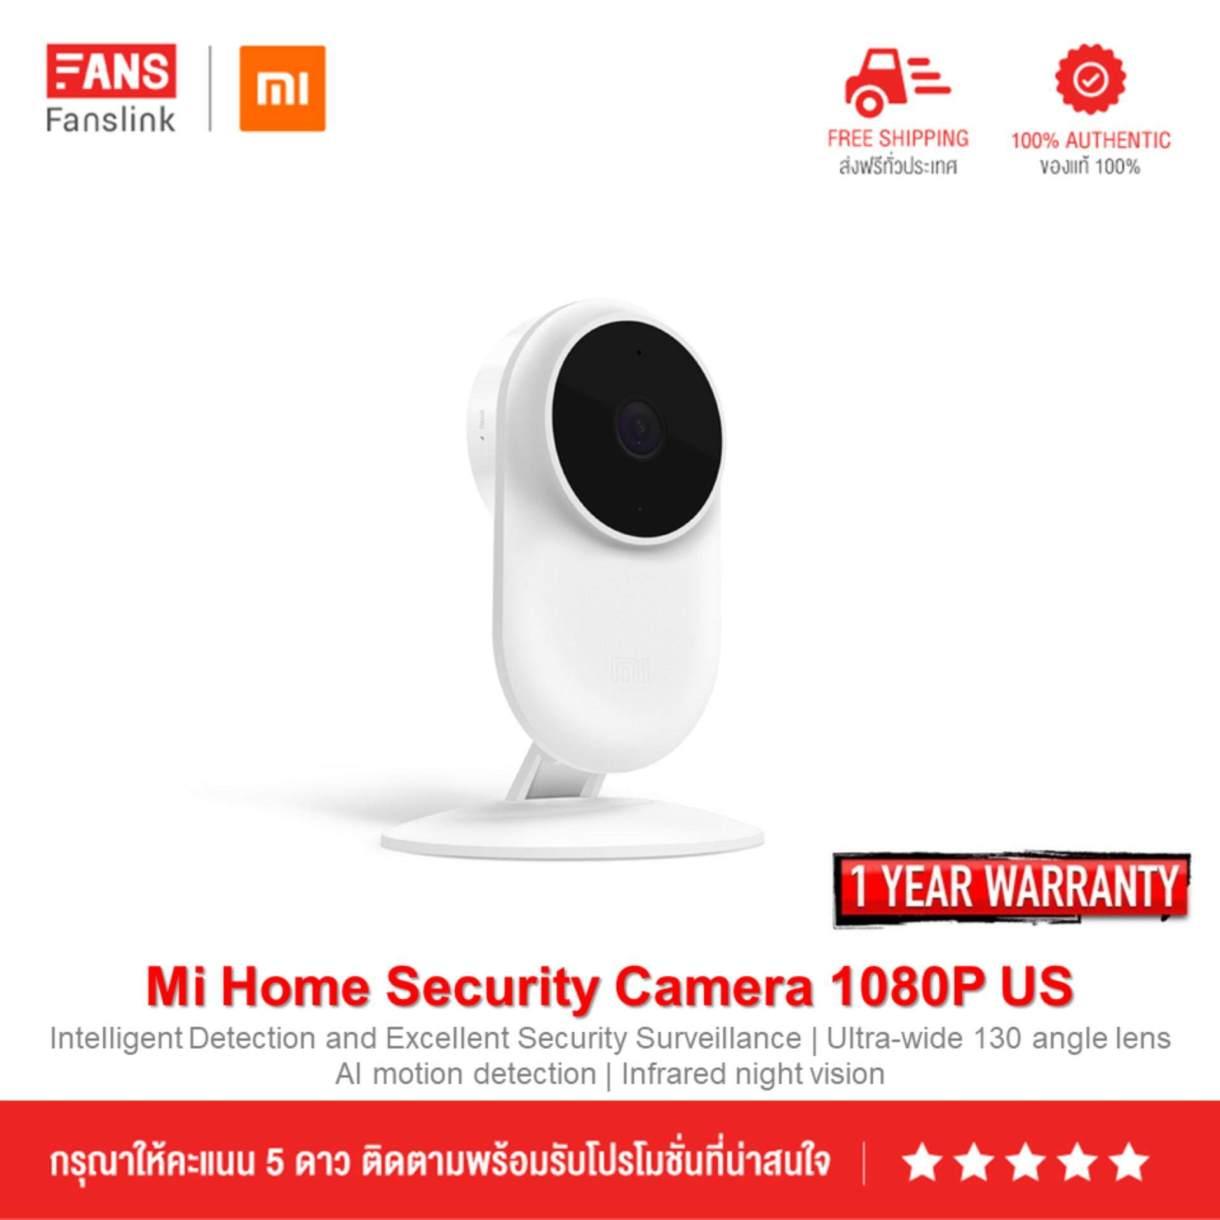 Mi Home security Camera Basic 1080p US แนะนำ 9 ไอเทมน่าสนใจของ Xiaomi - แนะนำ 9 ไอเทมน่าสนใจของ Xiaomi